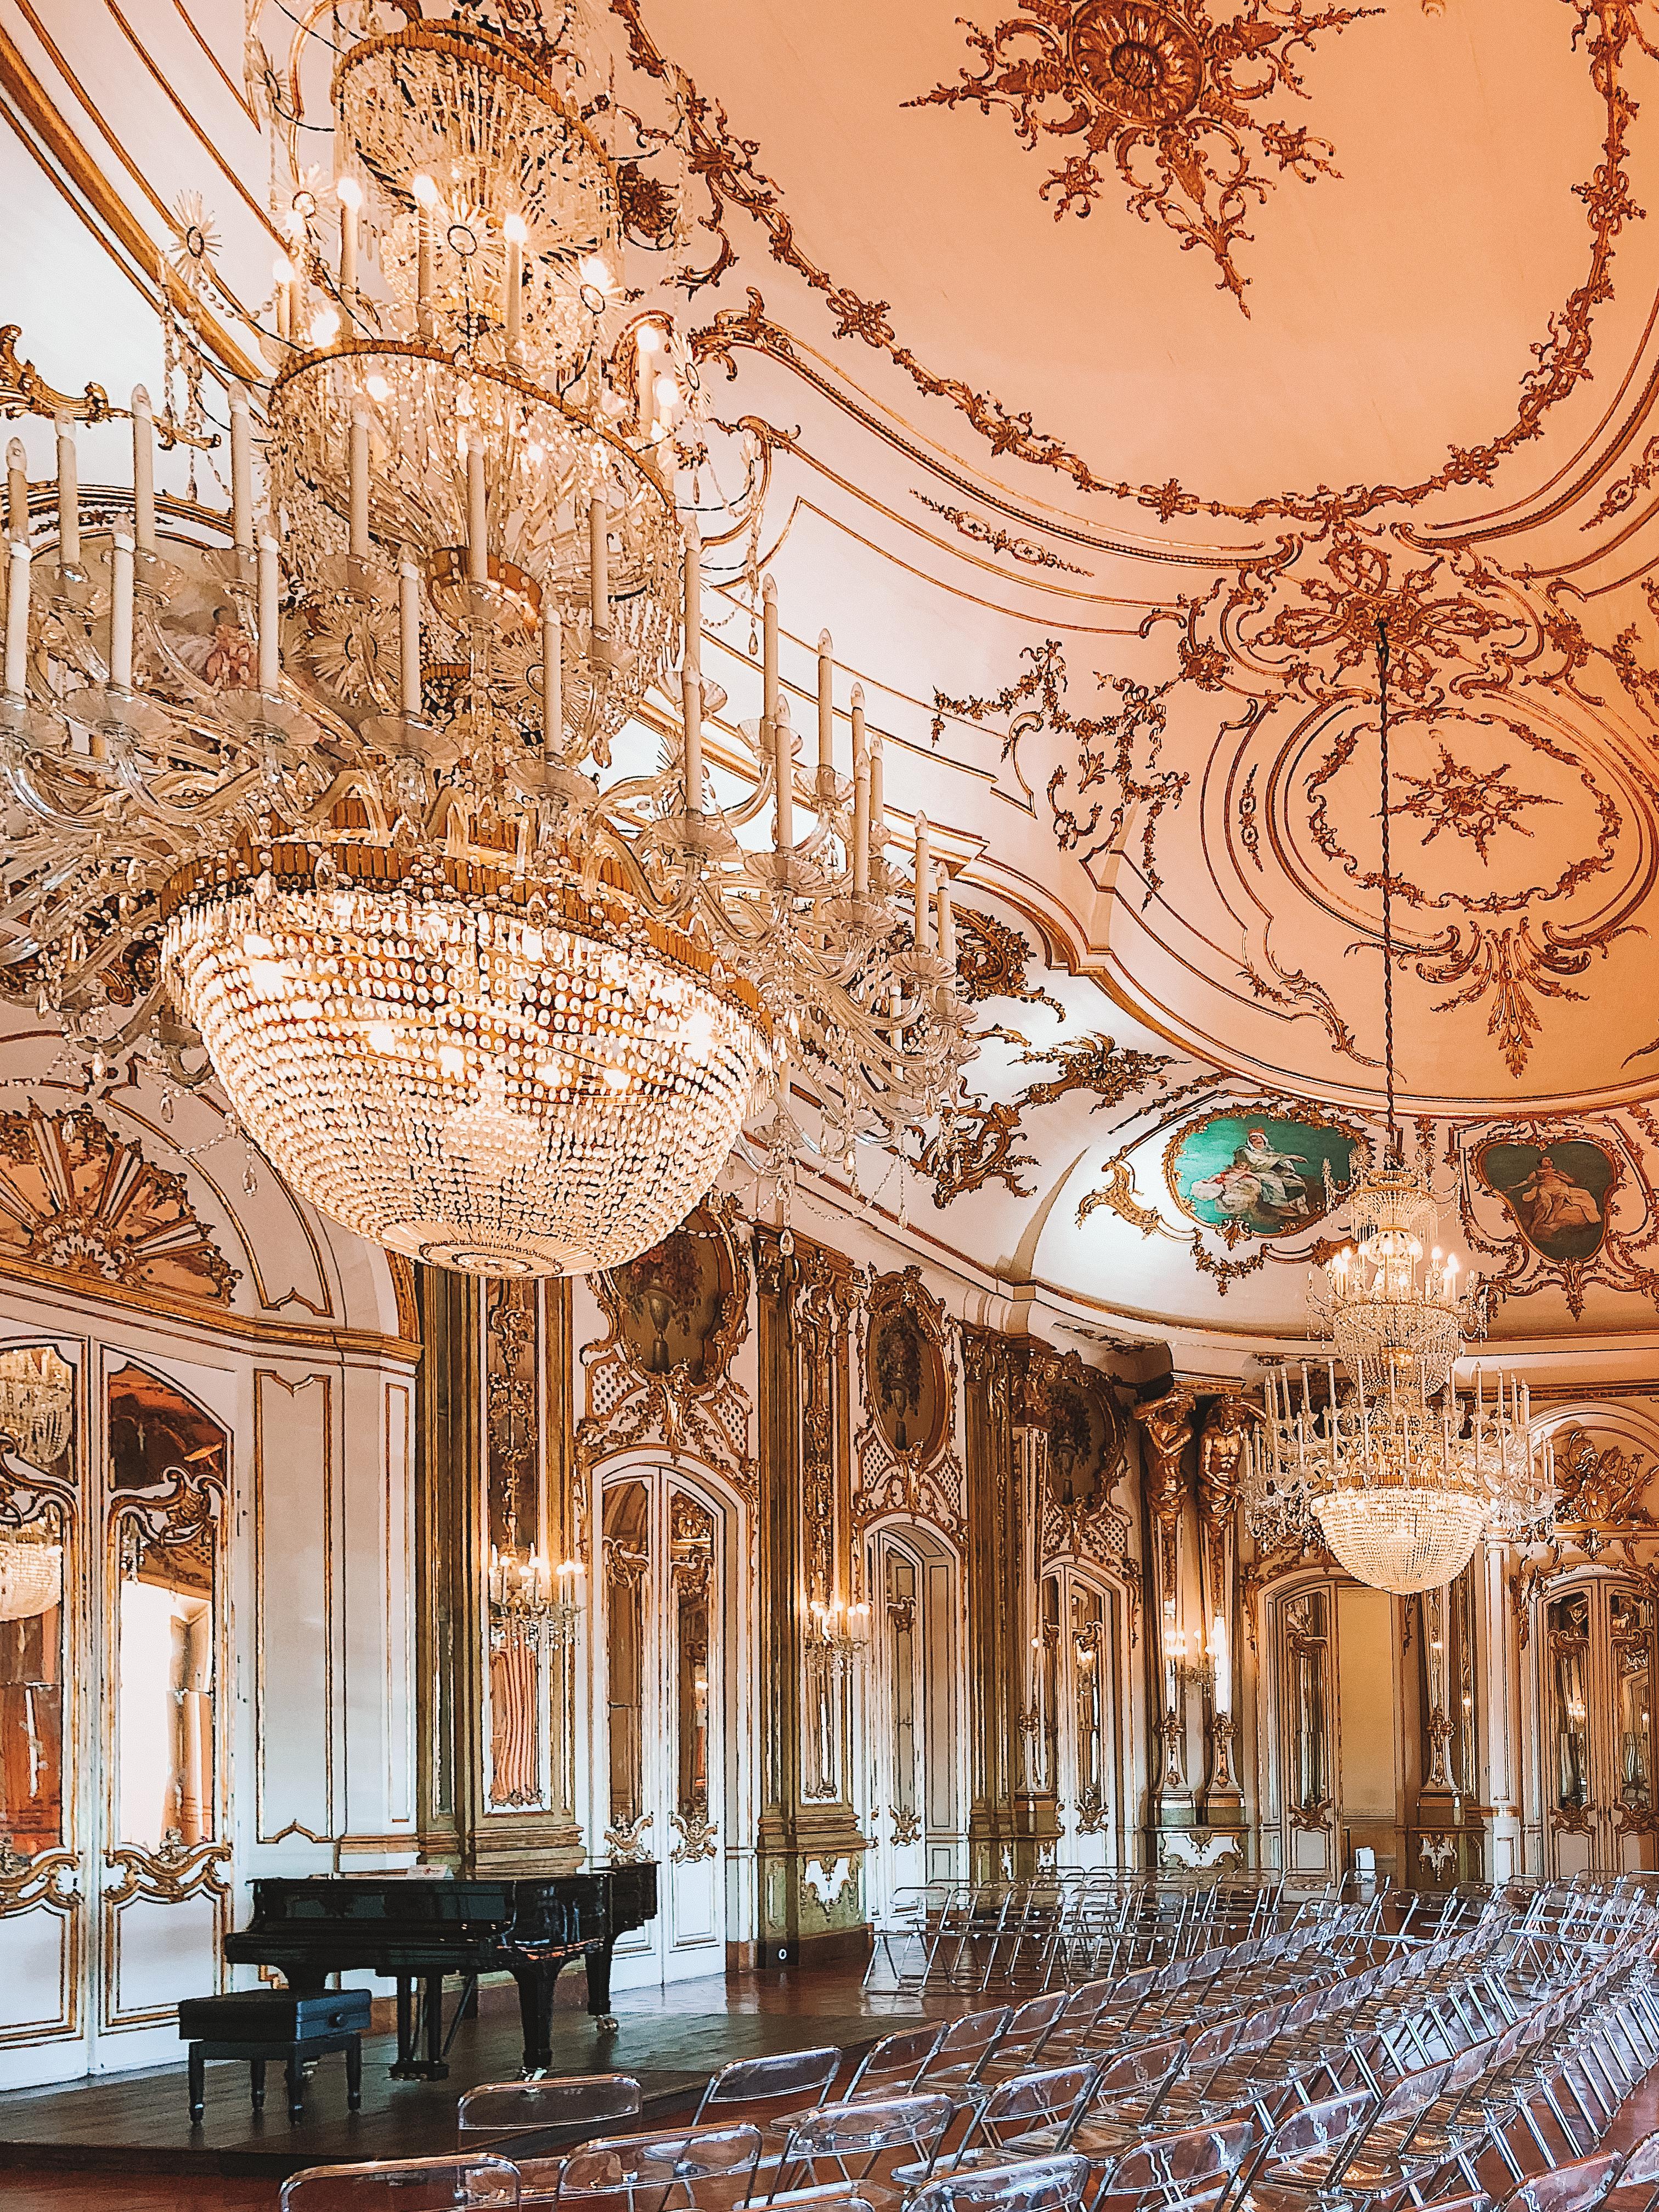 Muslim-travel-guide-Sintra-Portugal-Palace-of-Queluz-ballroom